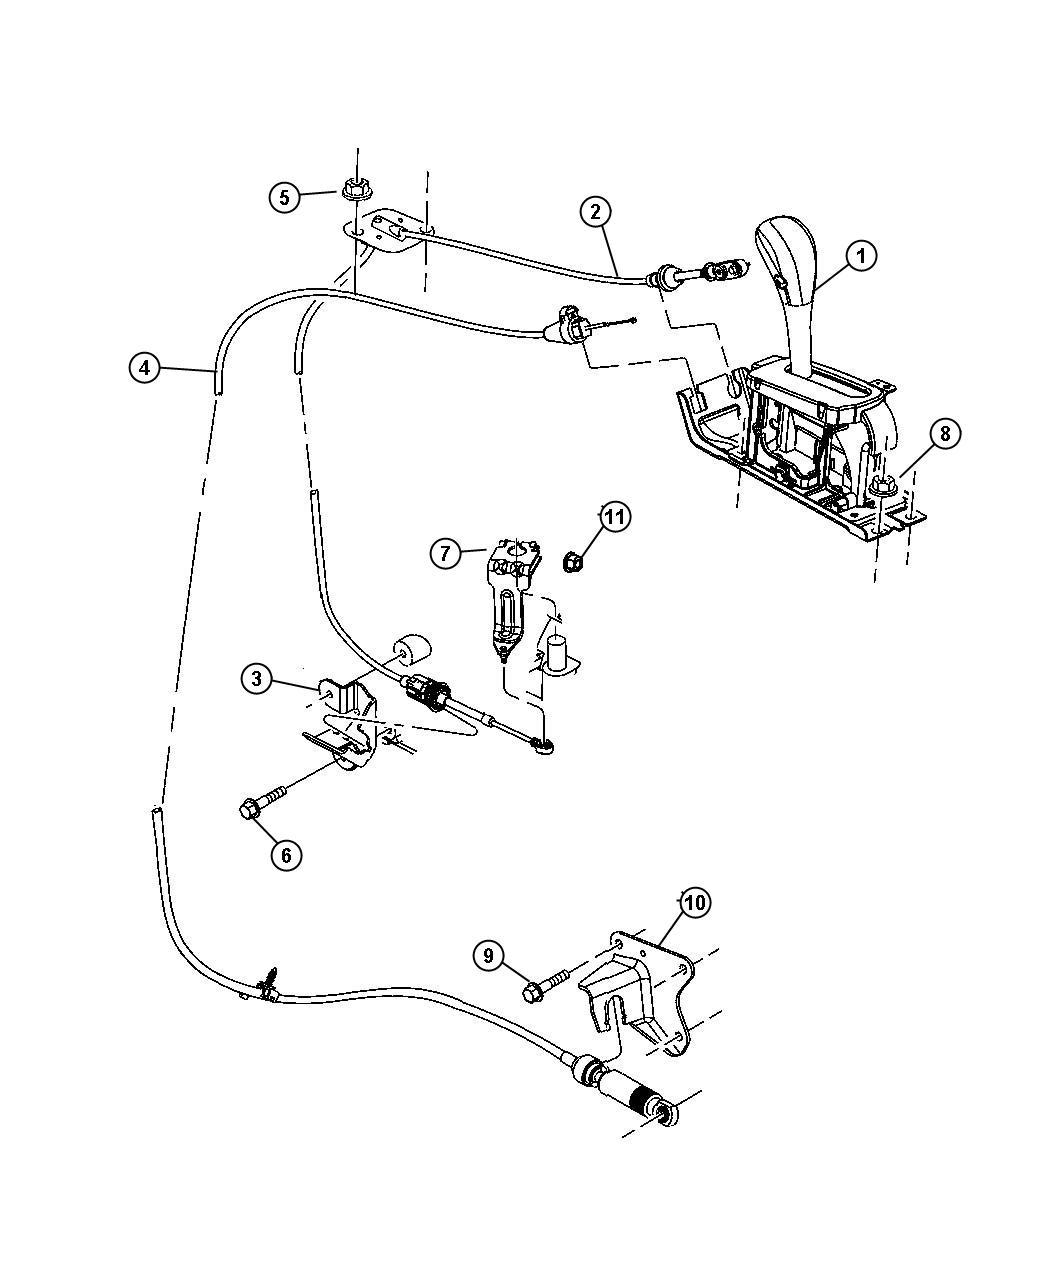 six stroke engine diagram free wiring diagram images